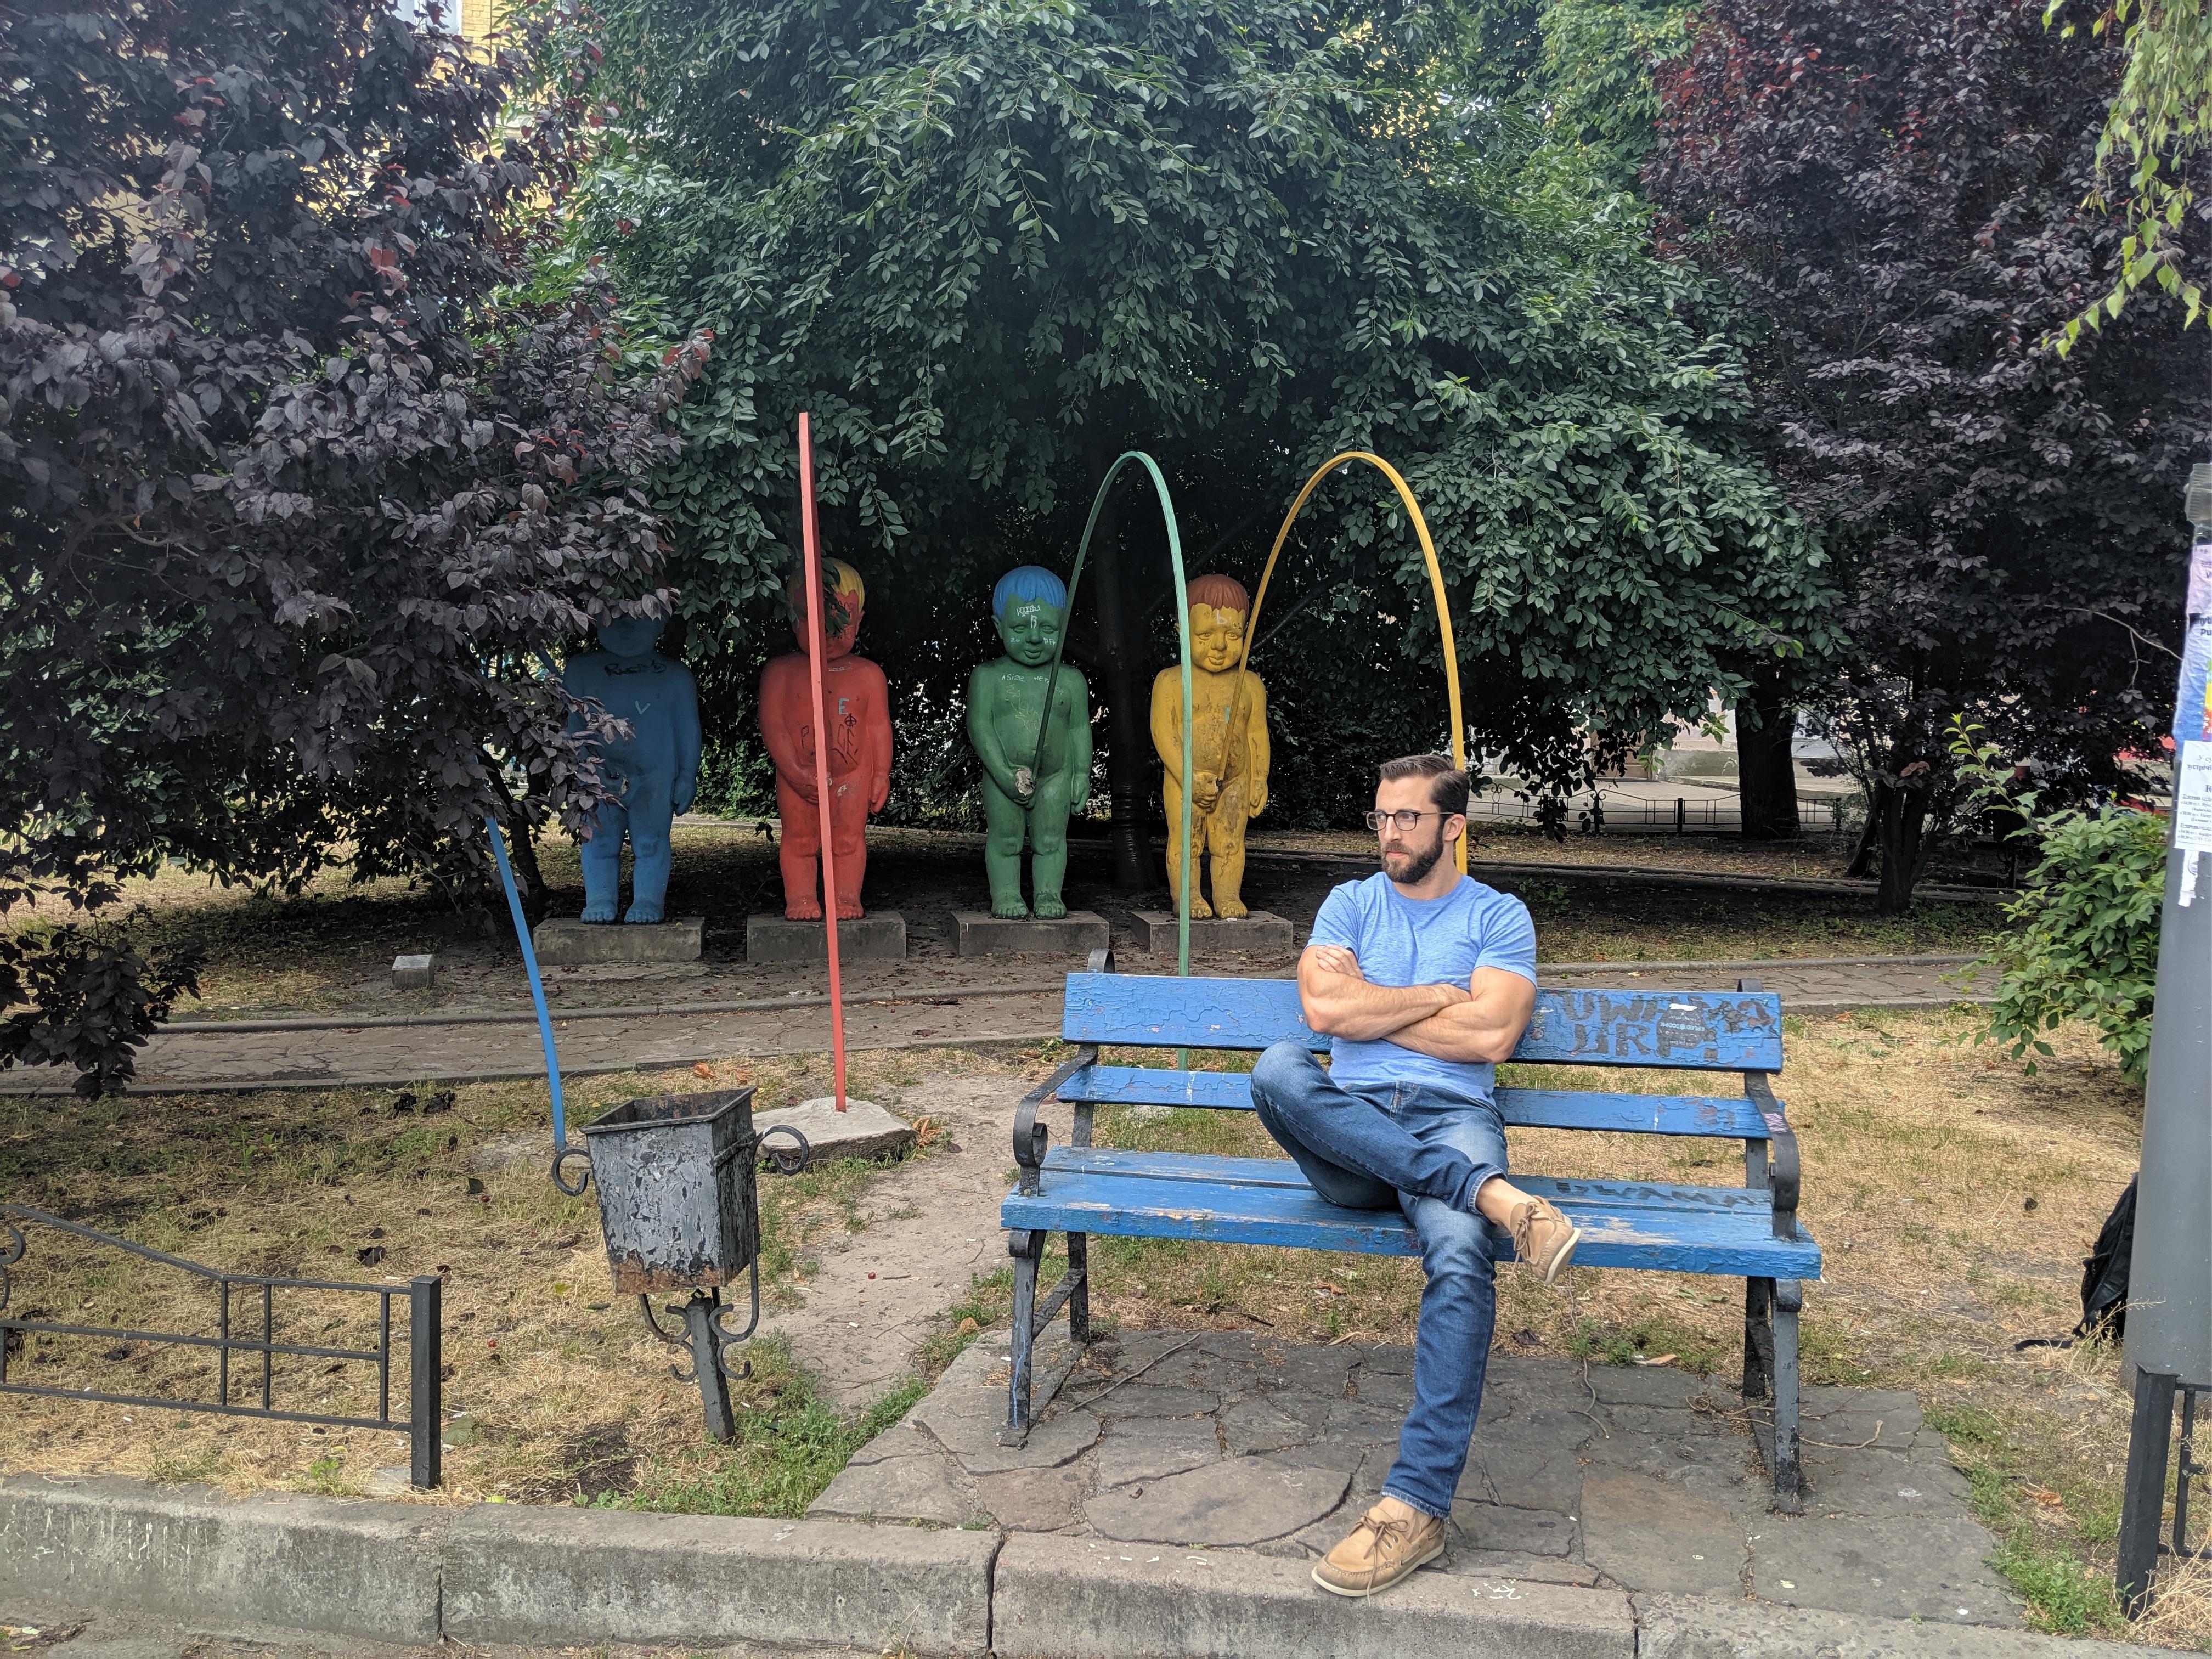 kiev ukraine peeing children